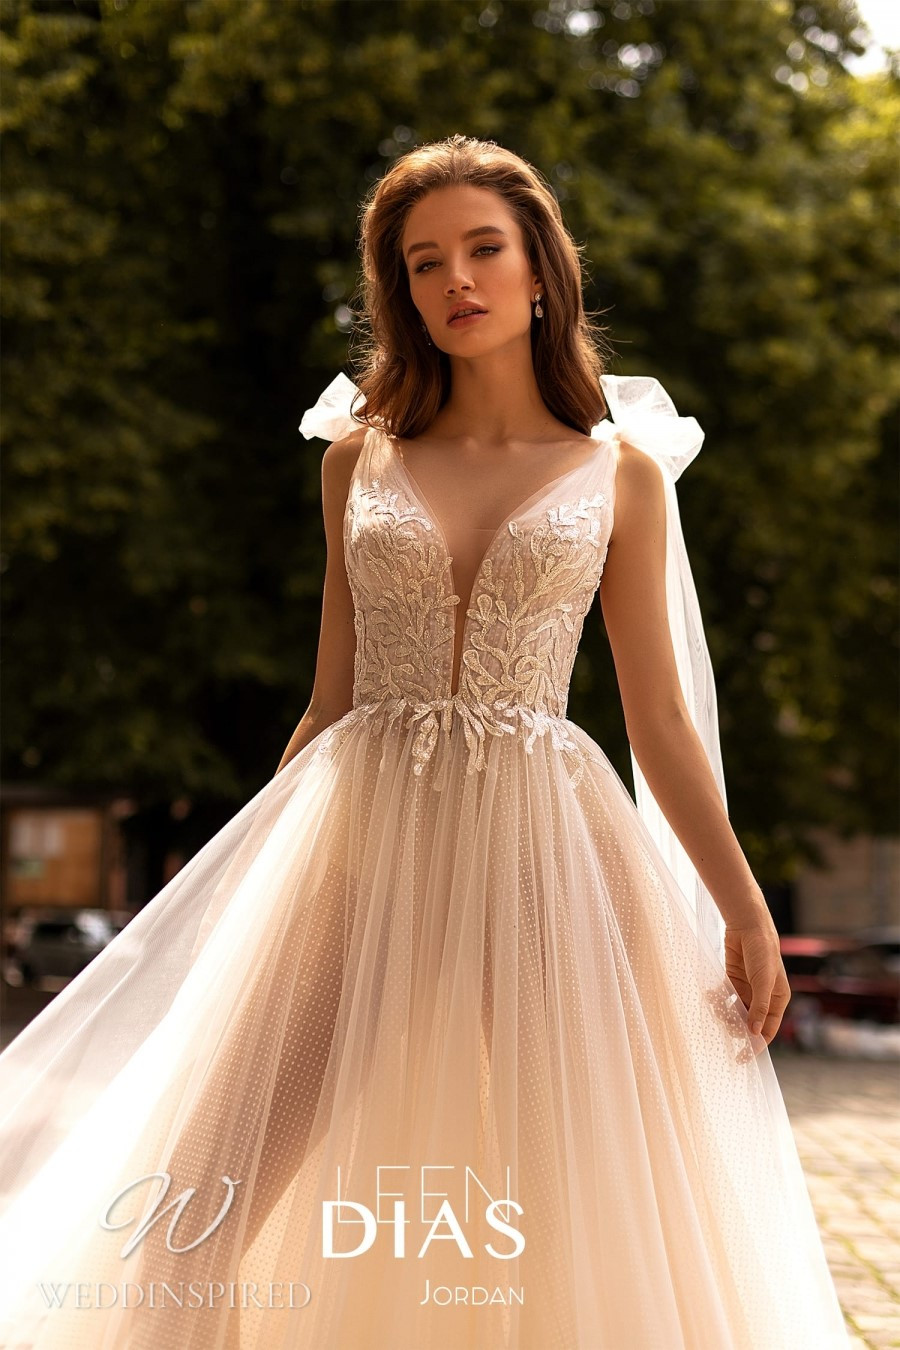 A Leen Dias 2021 blush tulle A-line wedding dress